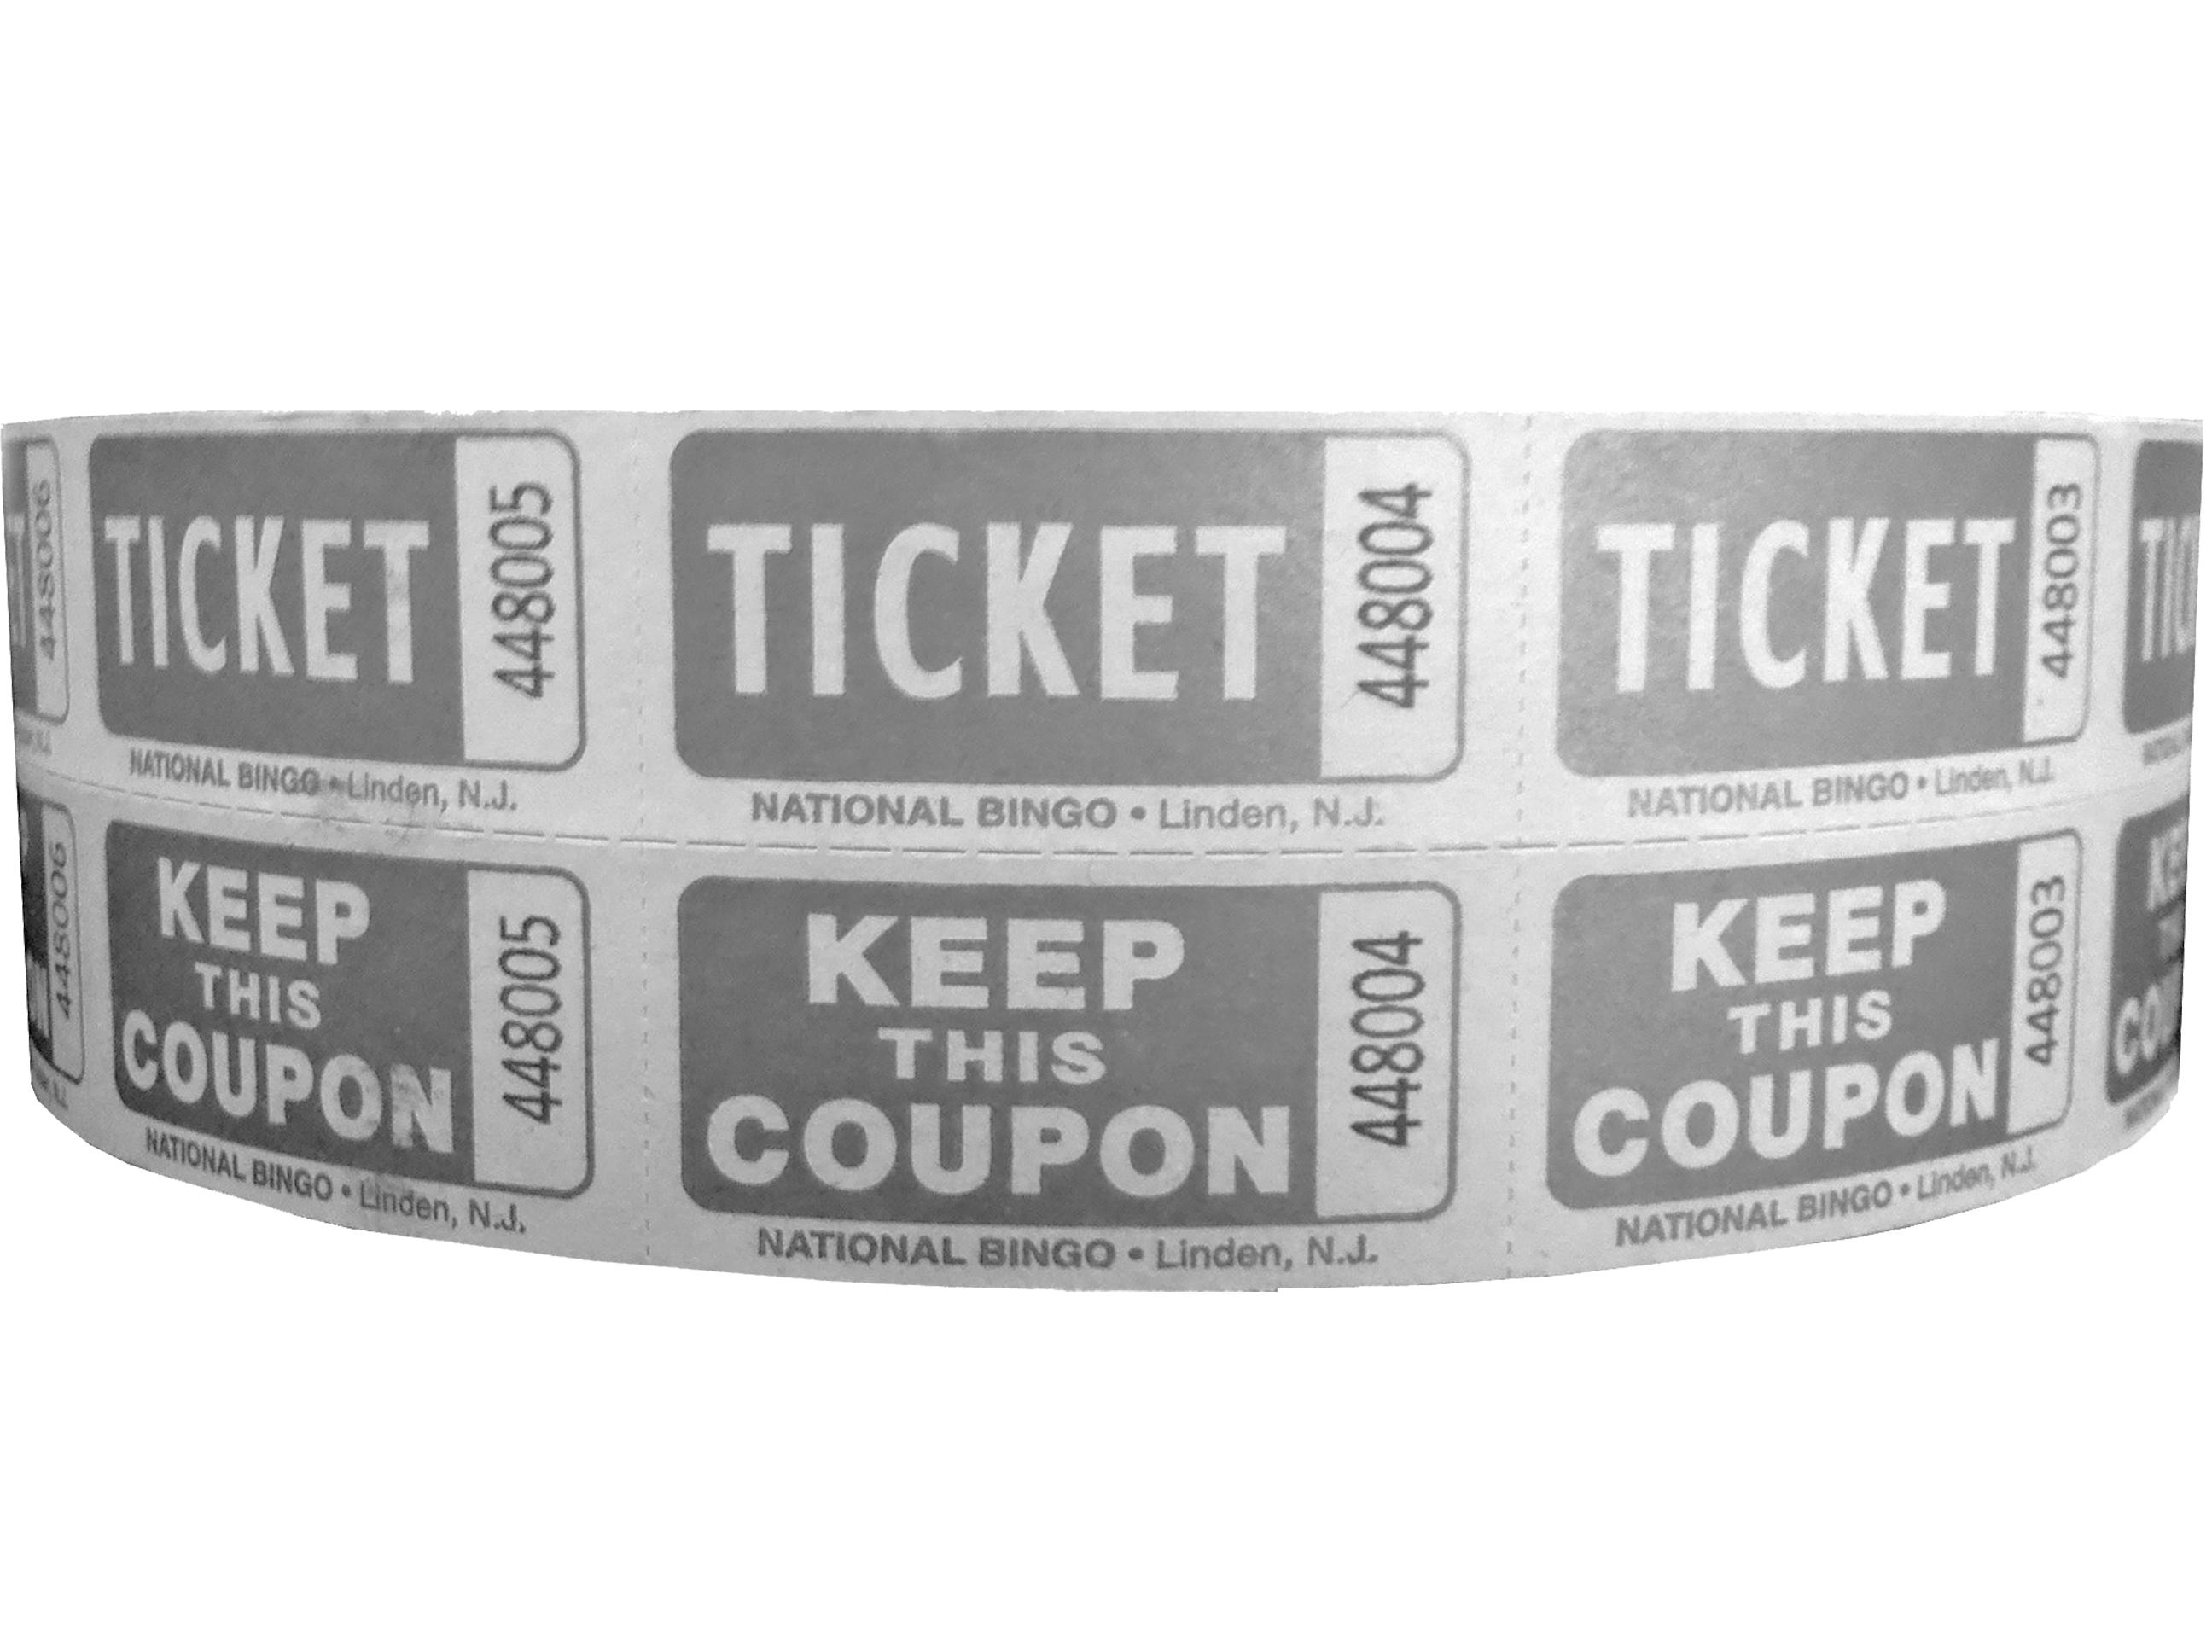 Silver Bristol Double Roll Tickets 2 X 2 Raffles, tickets, rolls, 50/50 tickets, 2 x 2 double roll tickets